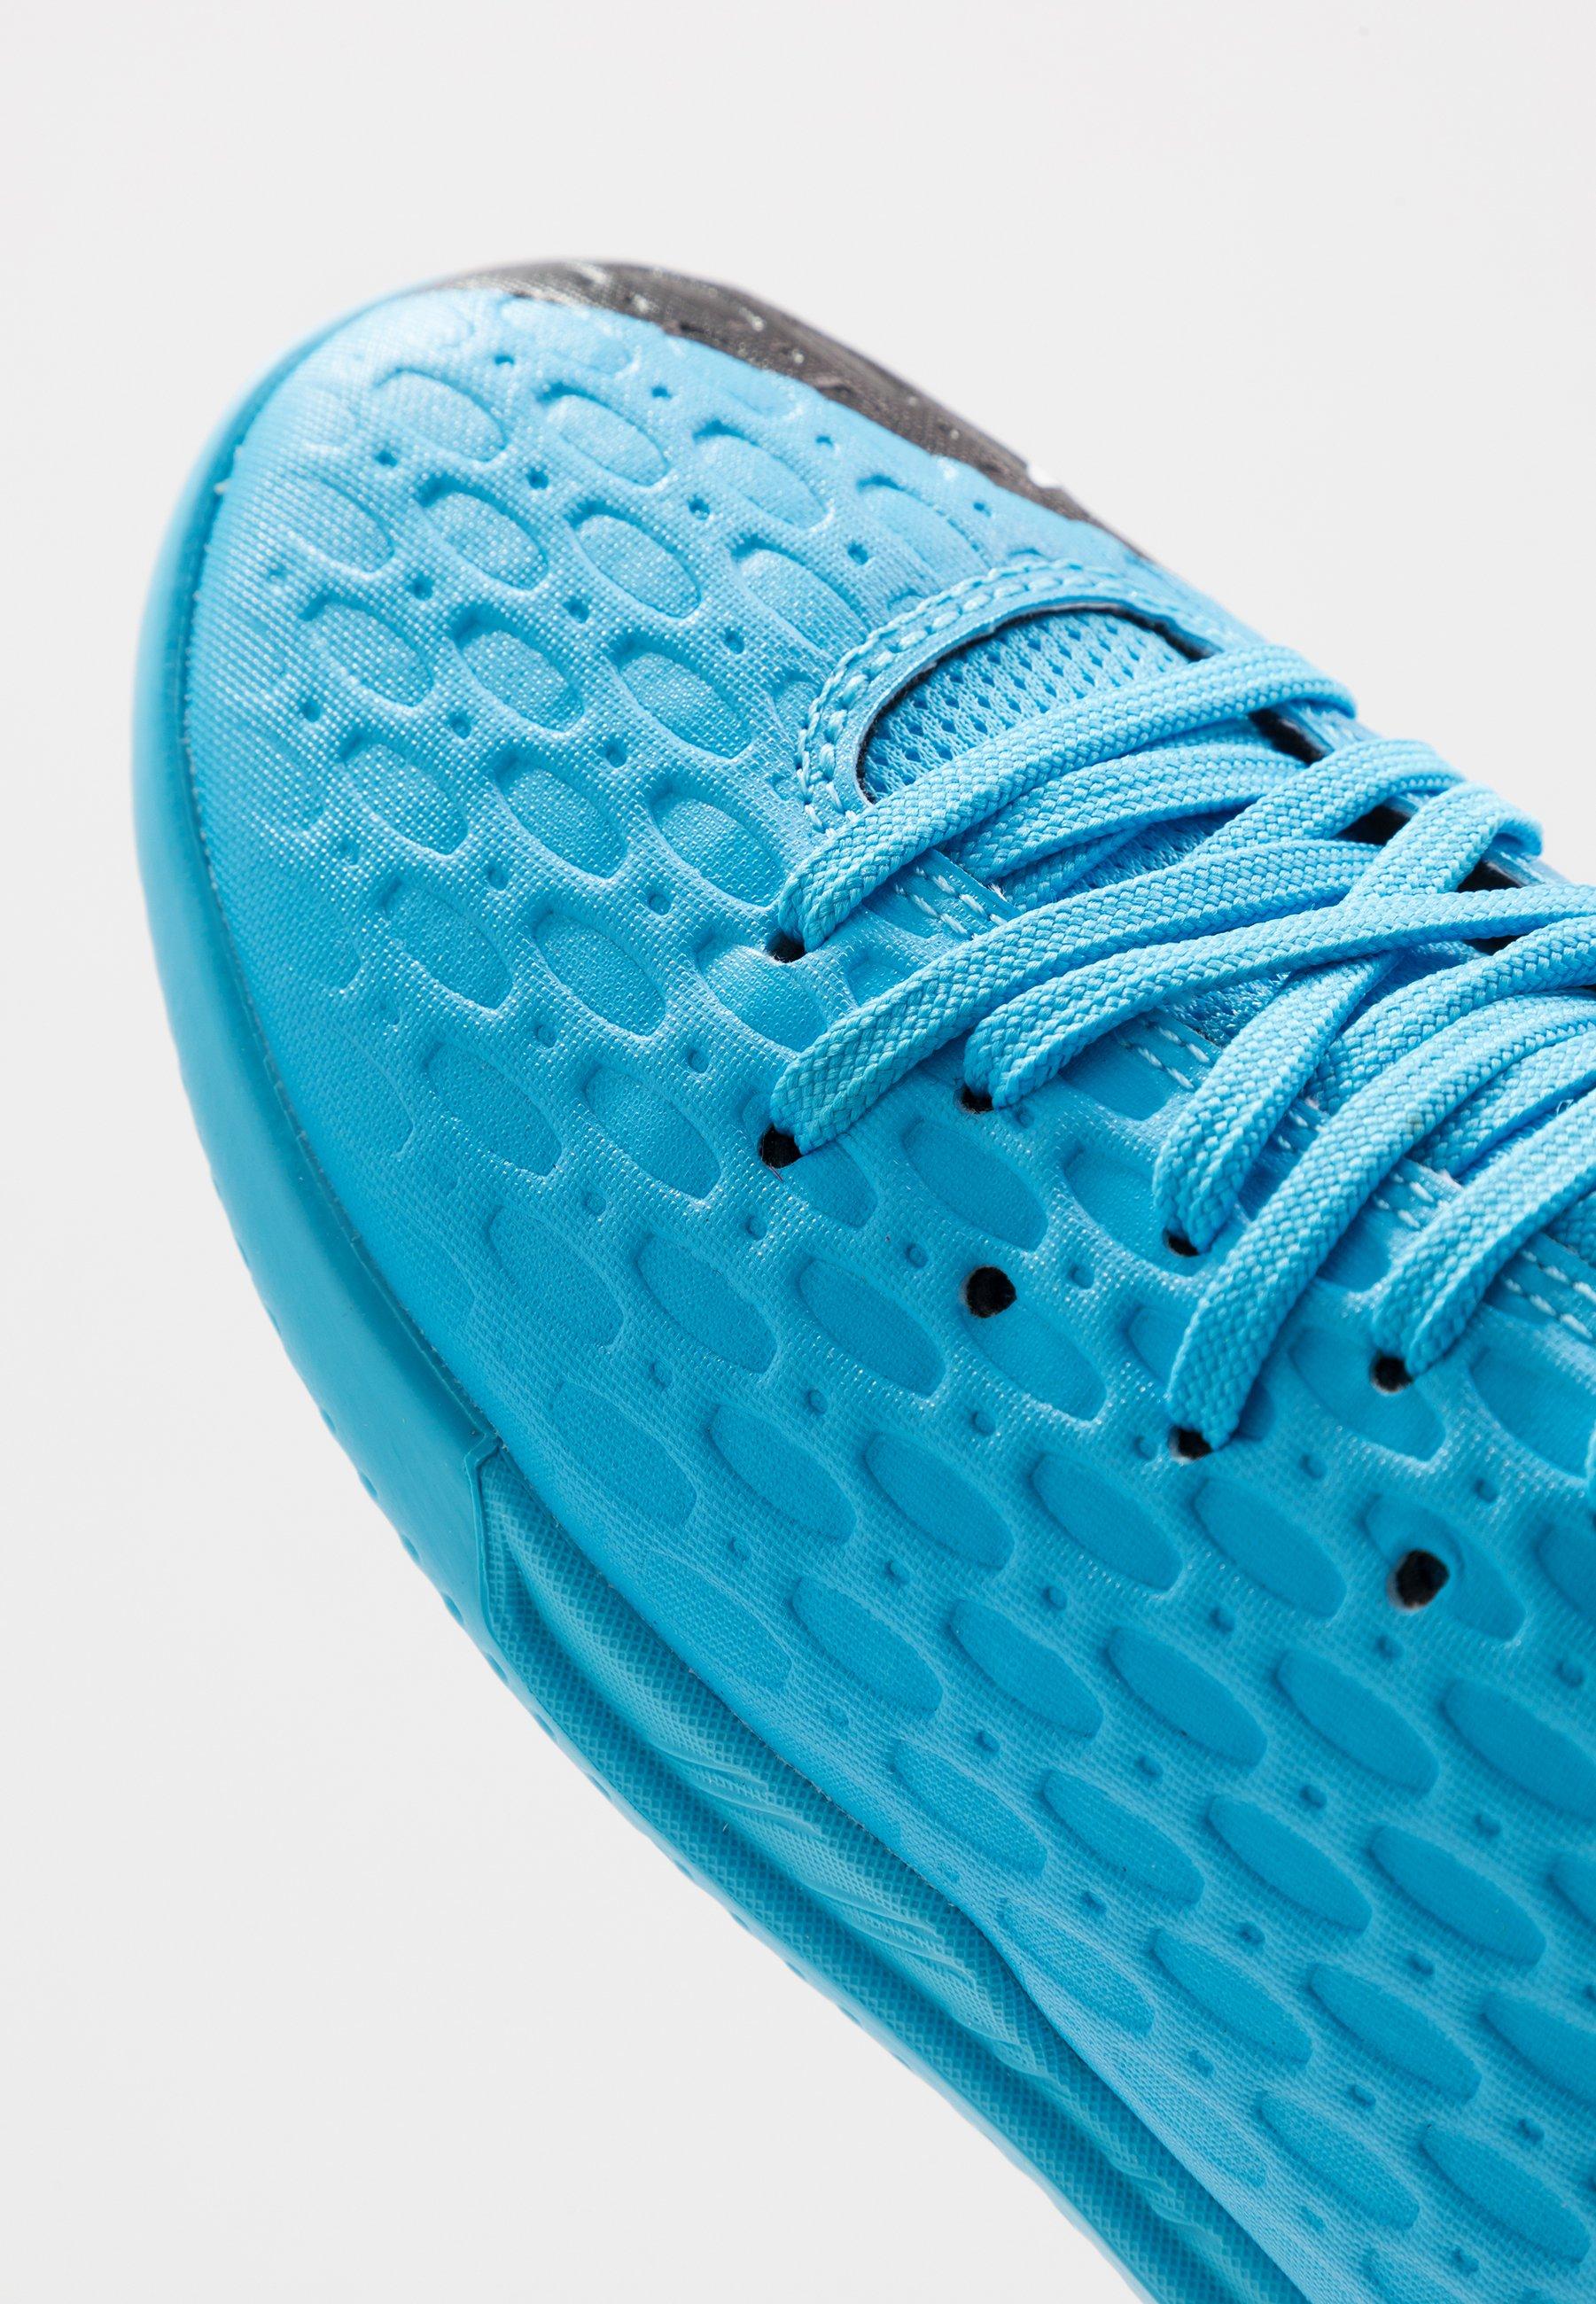 FUTURE 5.4 IT Chaussures de foot en salle luminous bluenrgy blueblackpink alert